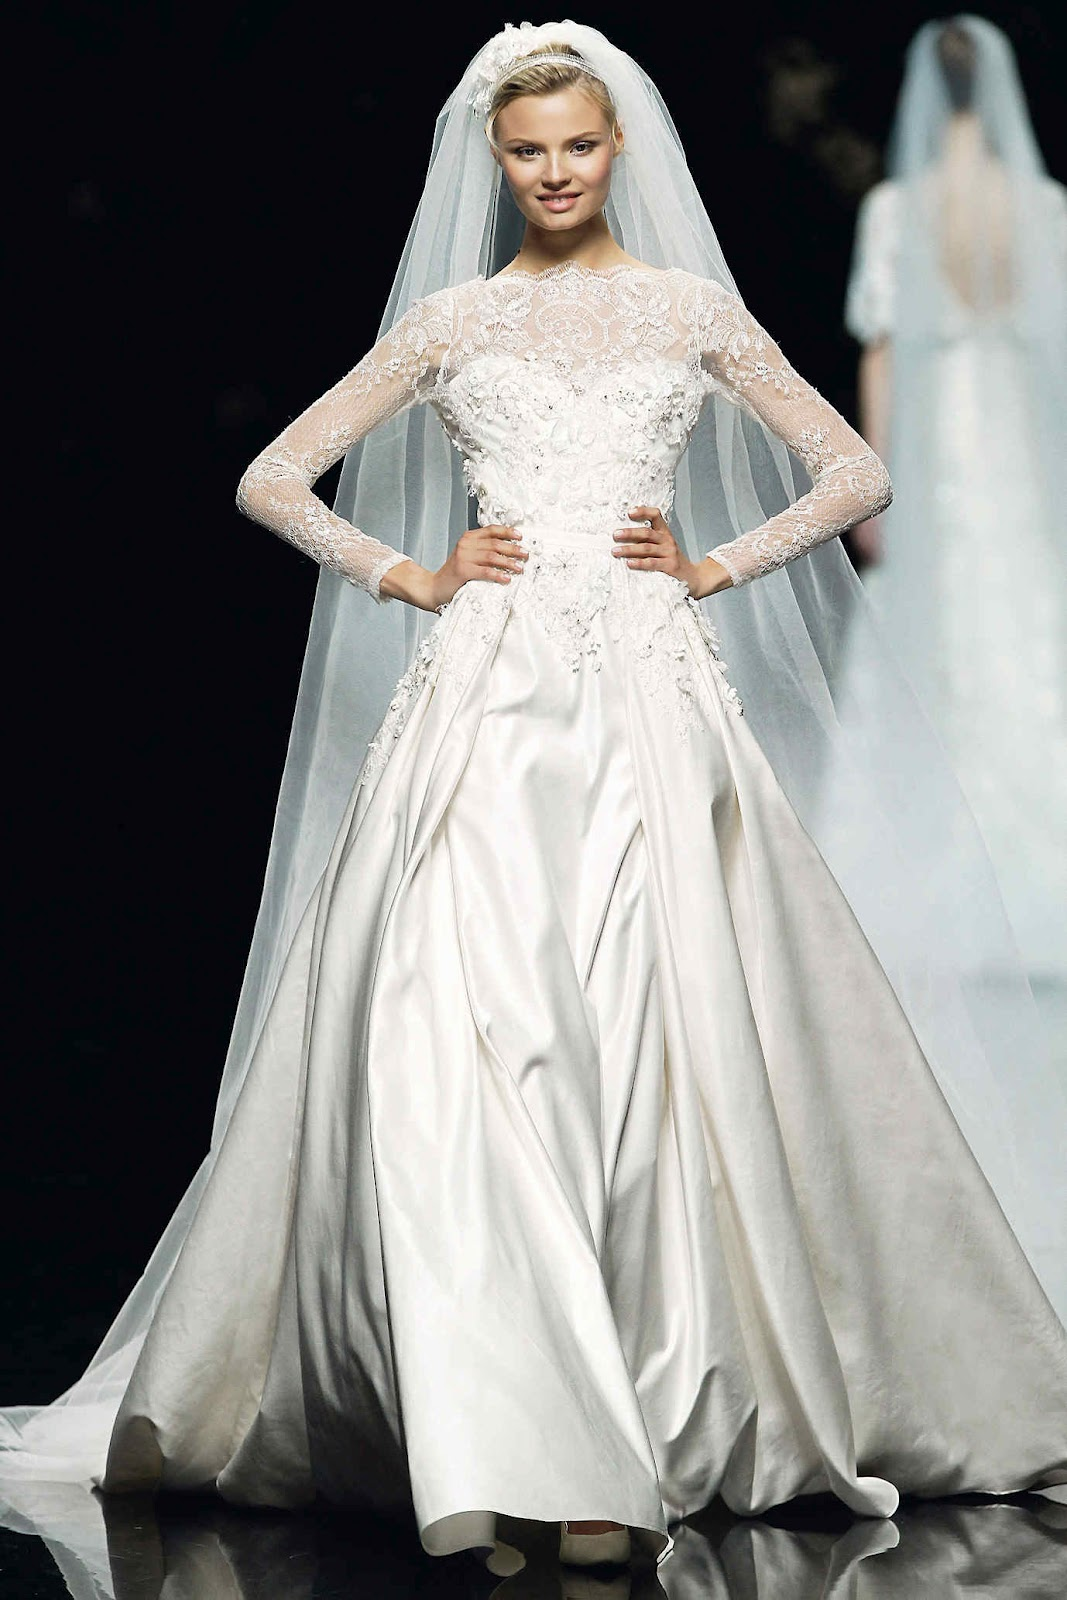 amore beauty fashion wedding bell wednesday elie saab barcelona bridal week 2012. Black Bedroom Furniture Sets. Home Design Ideas